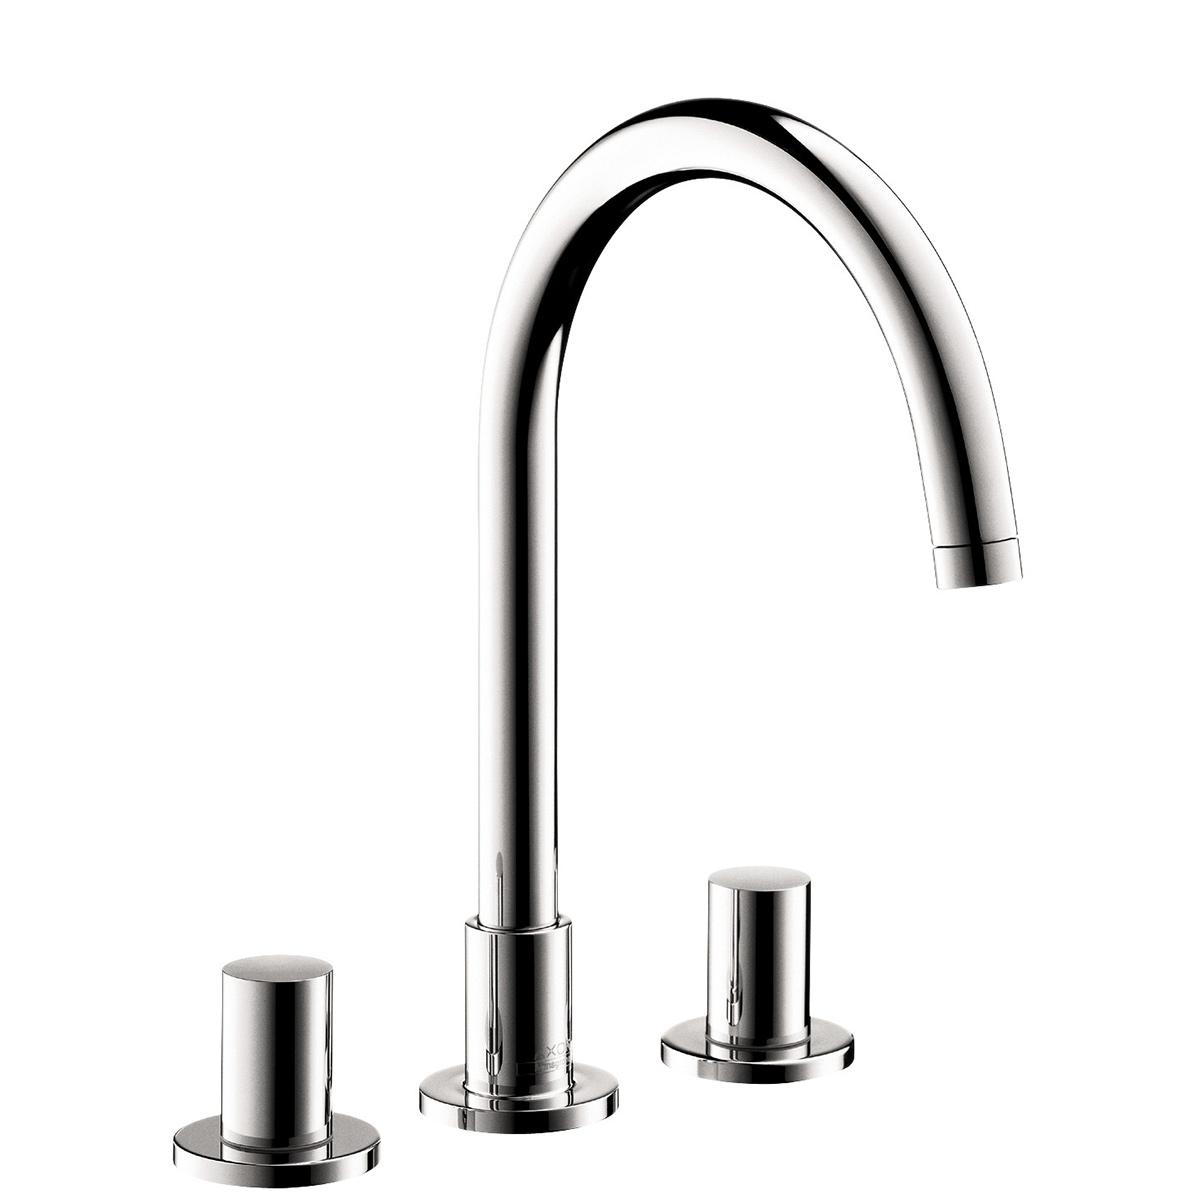 Bath4All - Hansgrohe 38053001 Chrome Axor Uno 2 Bathroom Faucet ...